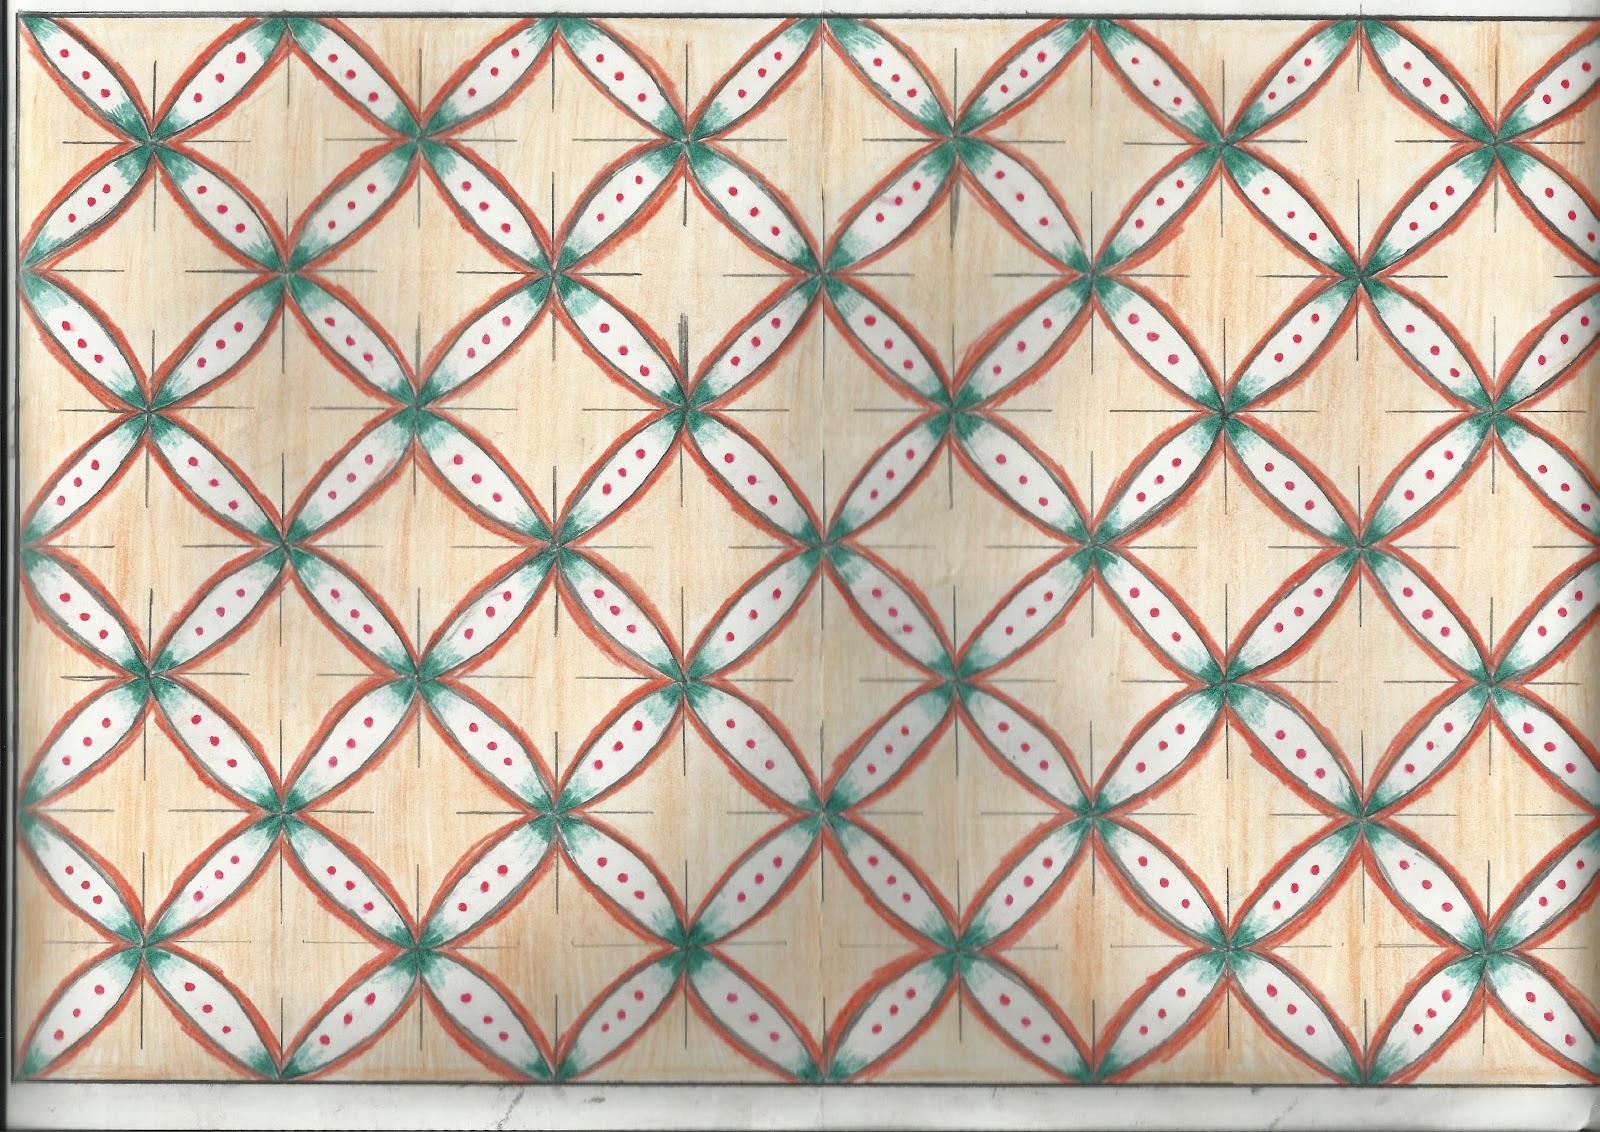 Class of Imagination Gambar  Batik  Kreasi Kelas VIII